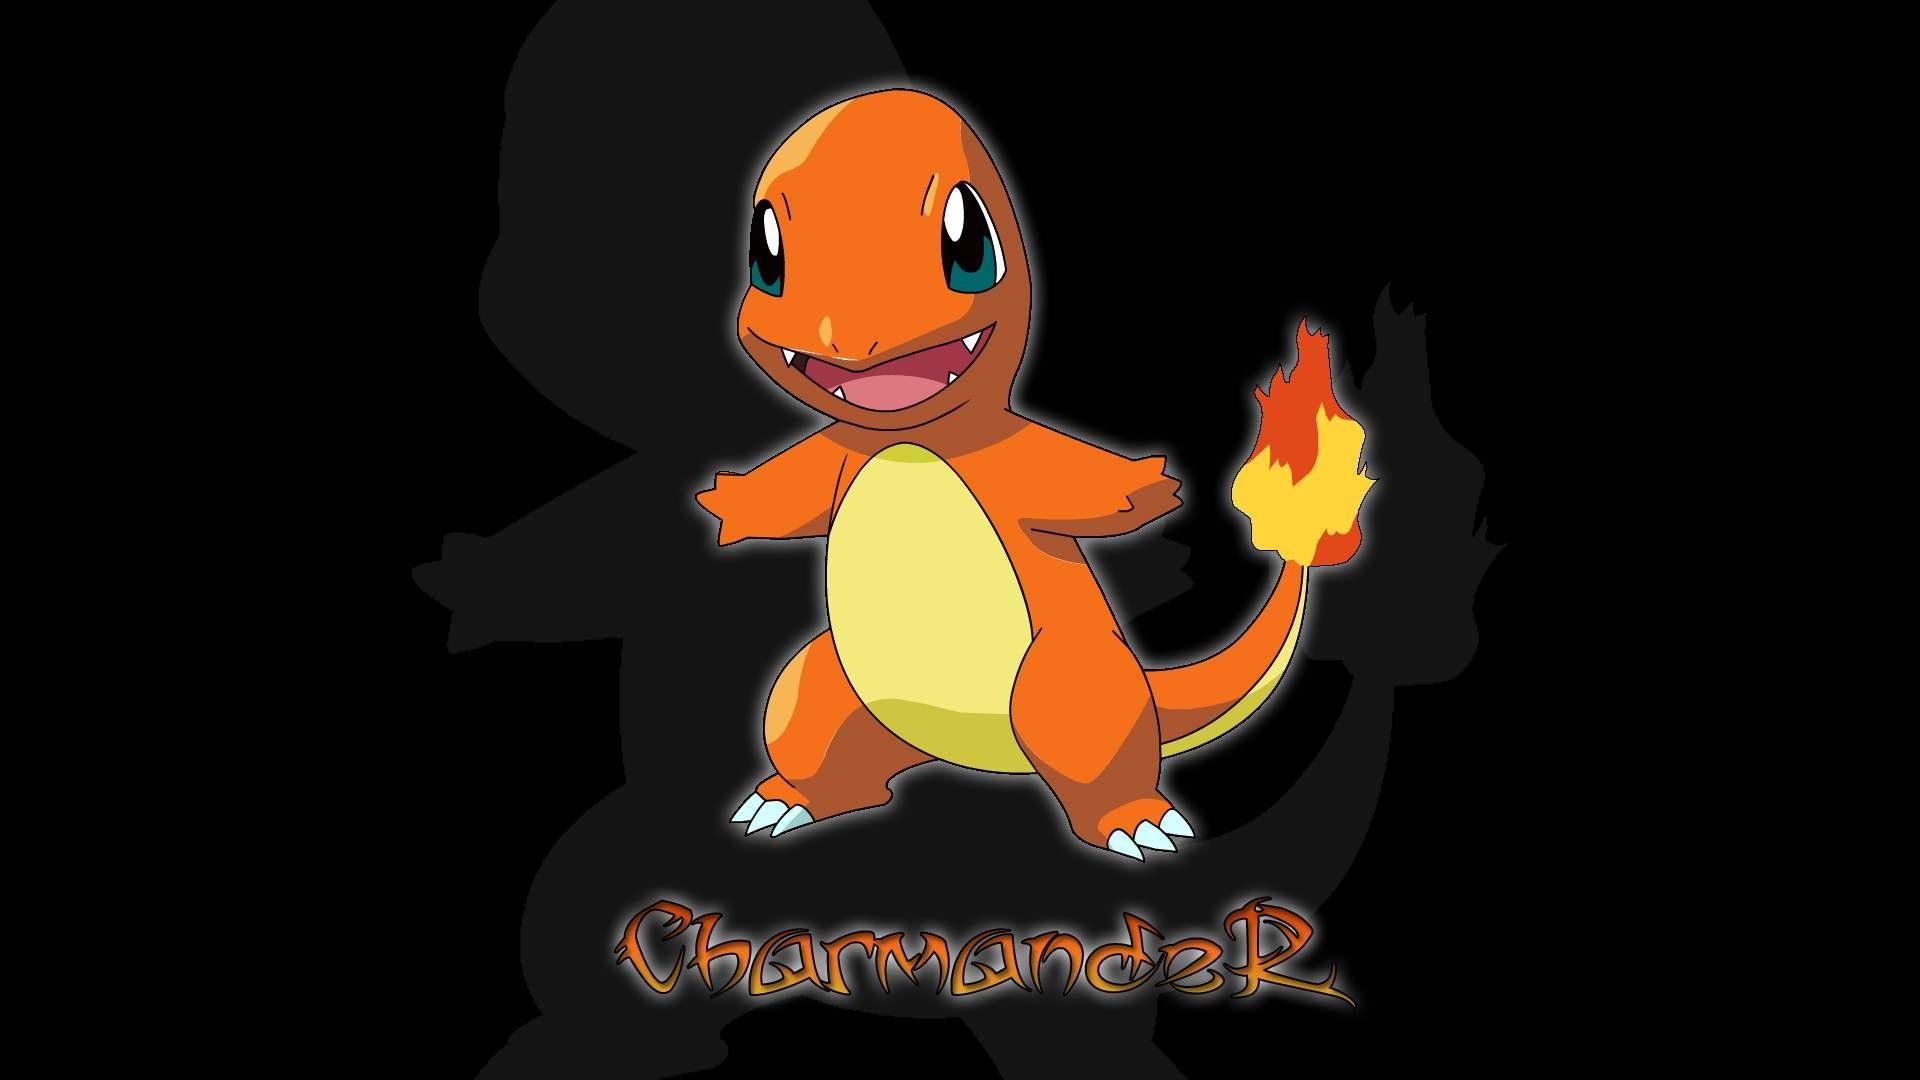 Charmander :: Pokemon Wallpaper